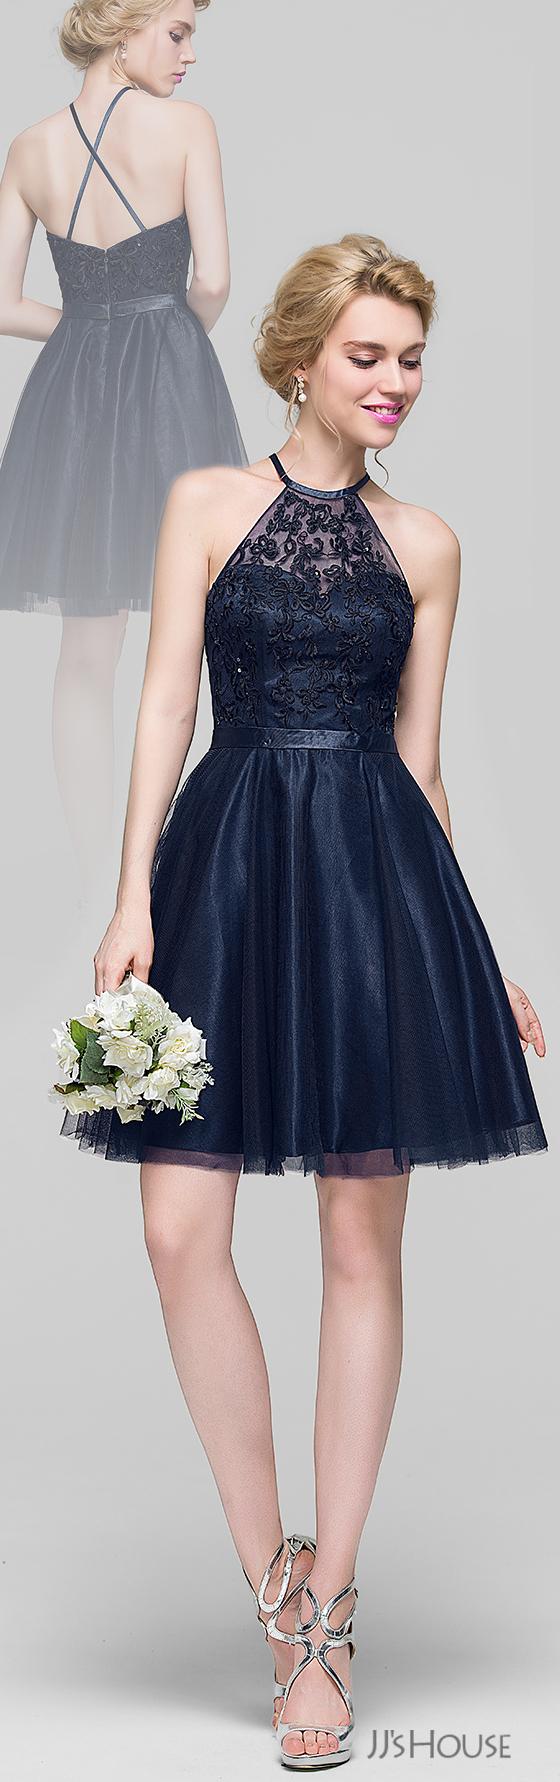 Jjshouse bridesmaid vestido coktel pinterest gowns frocks